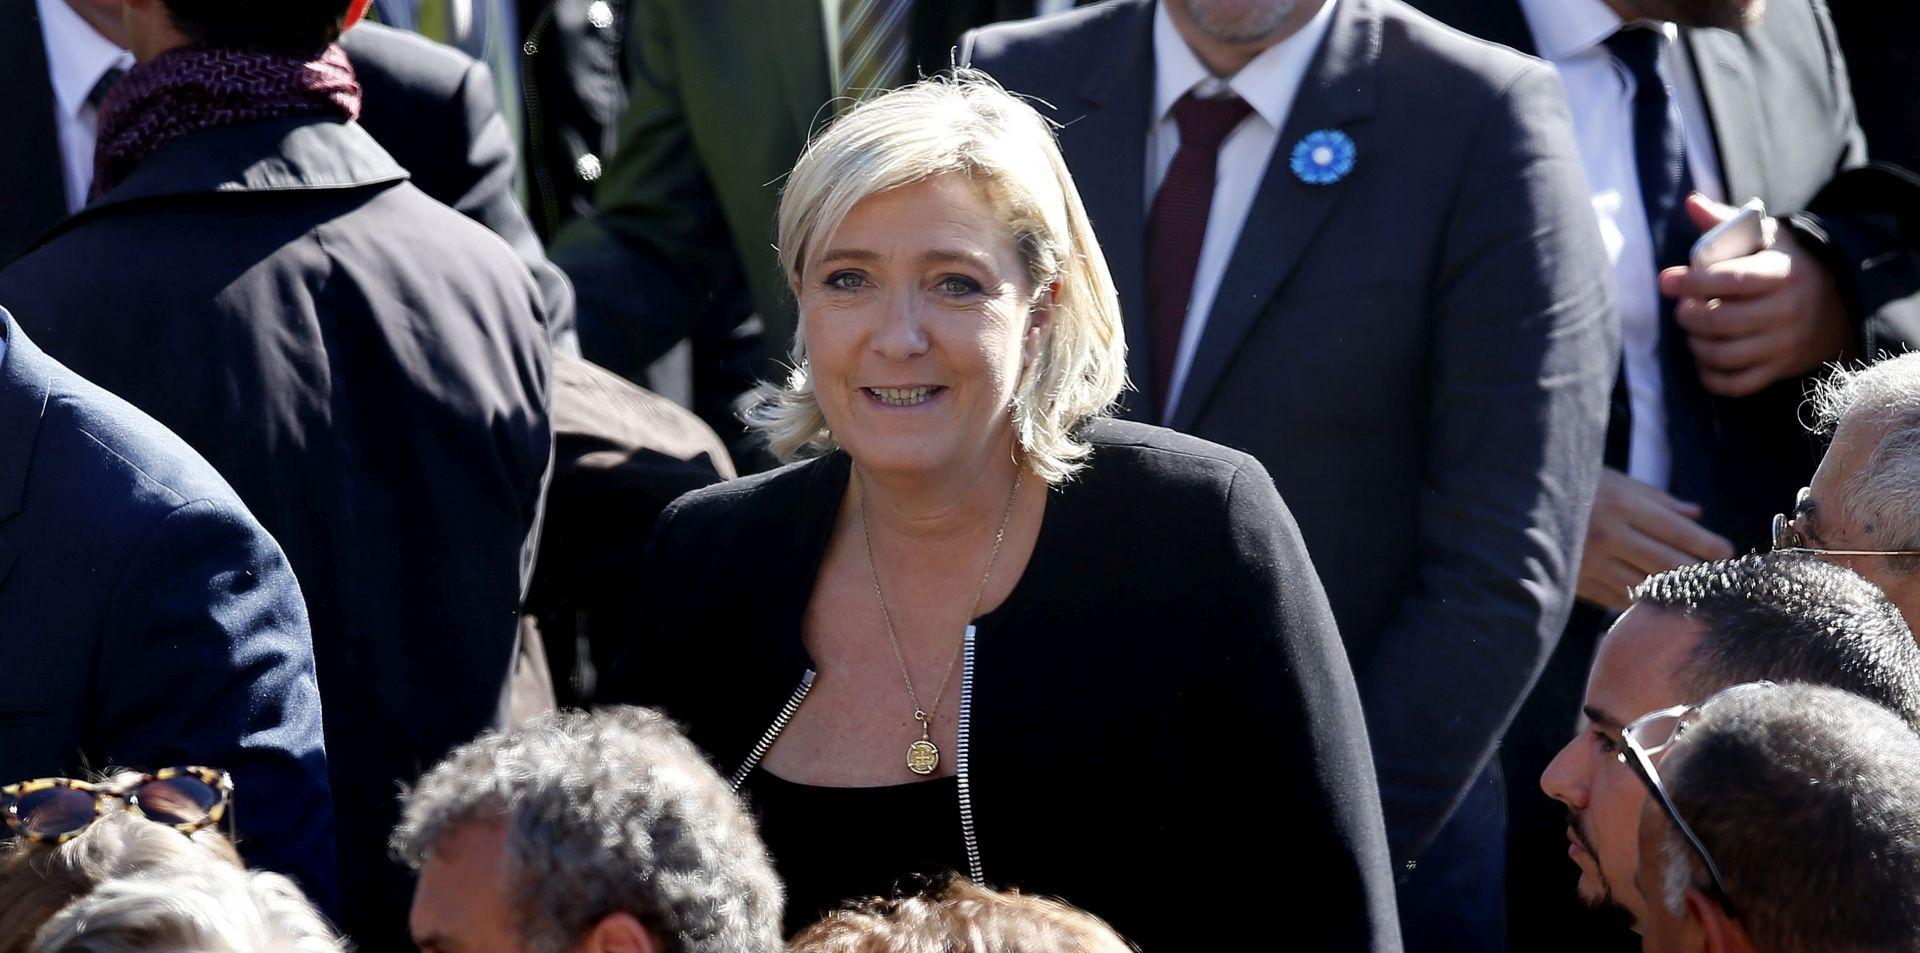 EP traži od Marine Le Pen da vrati 340.000 eura